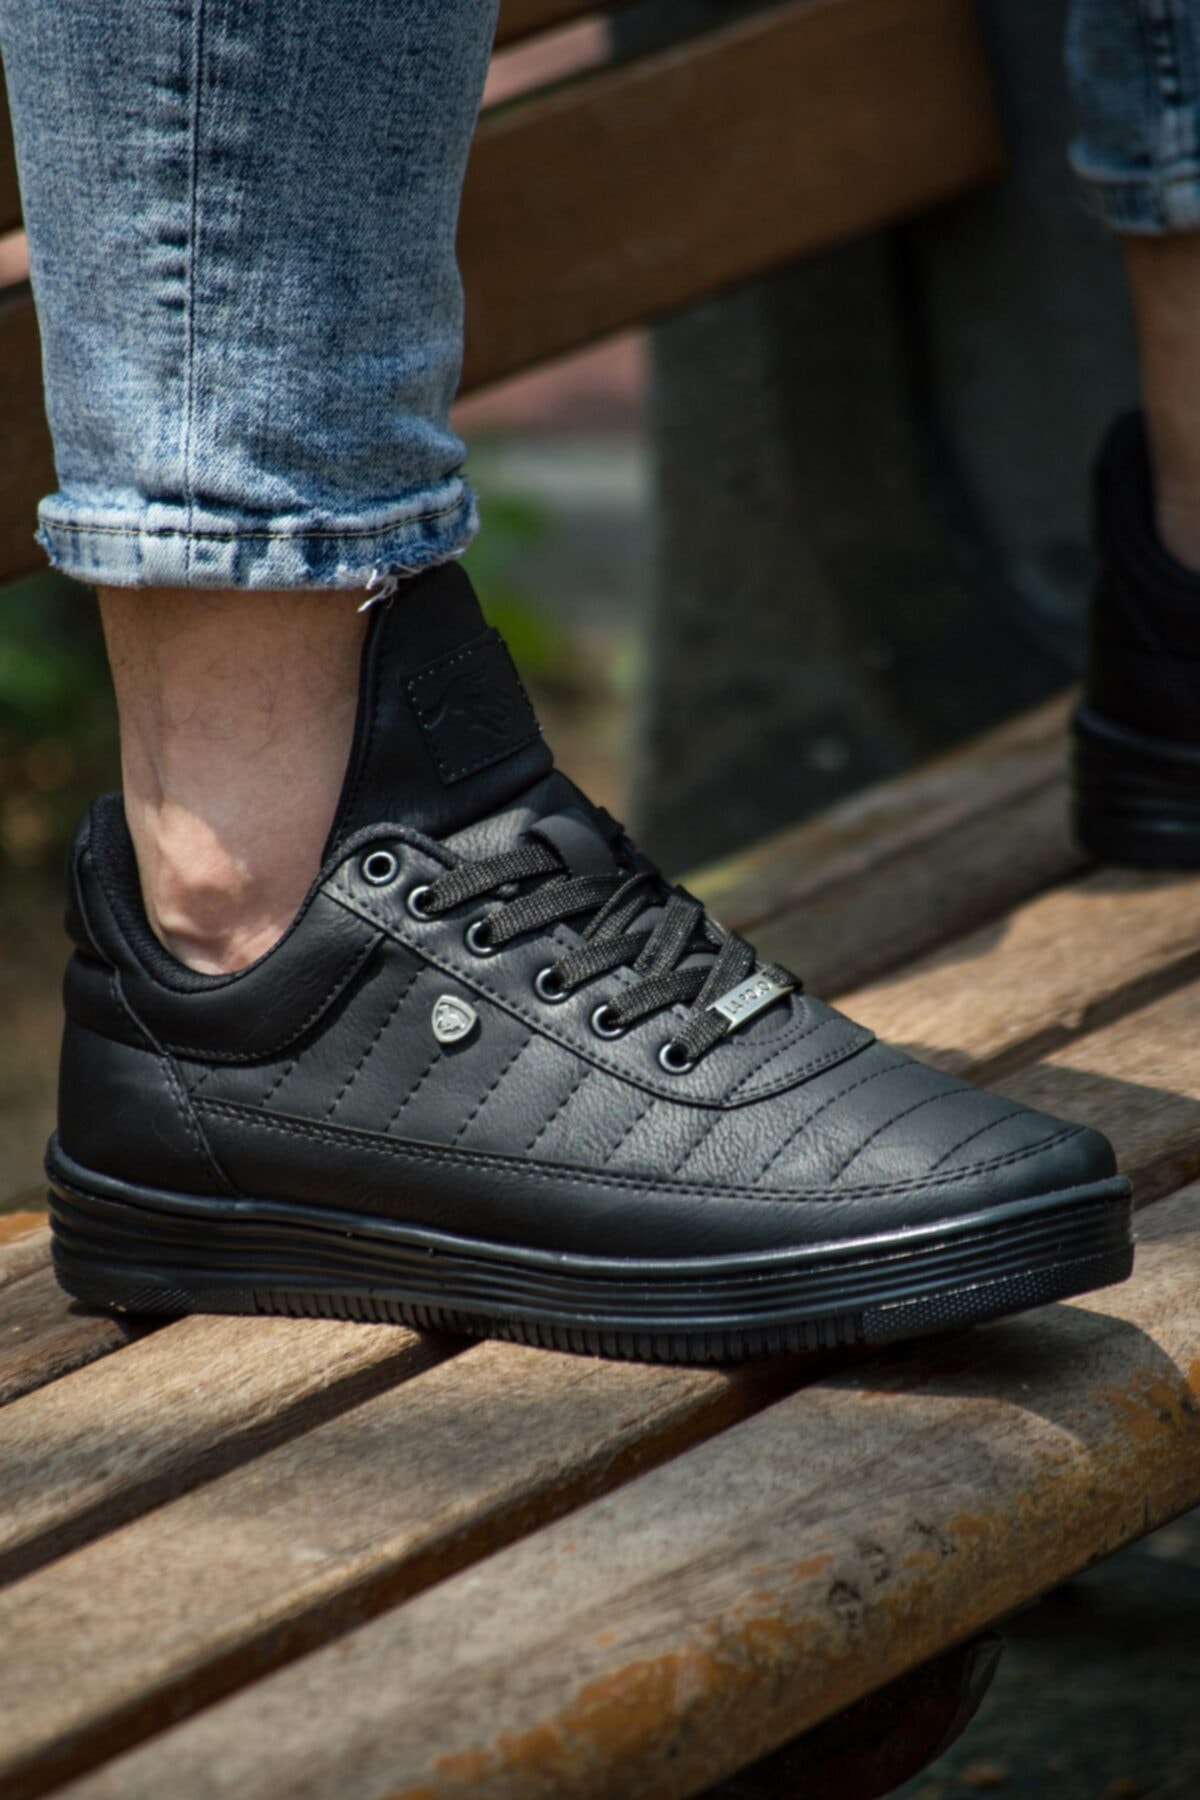 07 Siyah Siyah Dikişli Unisex Spor Ayakkabı